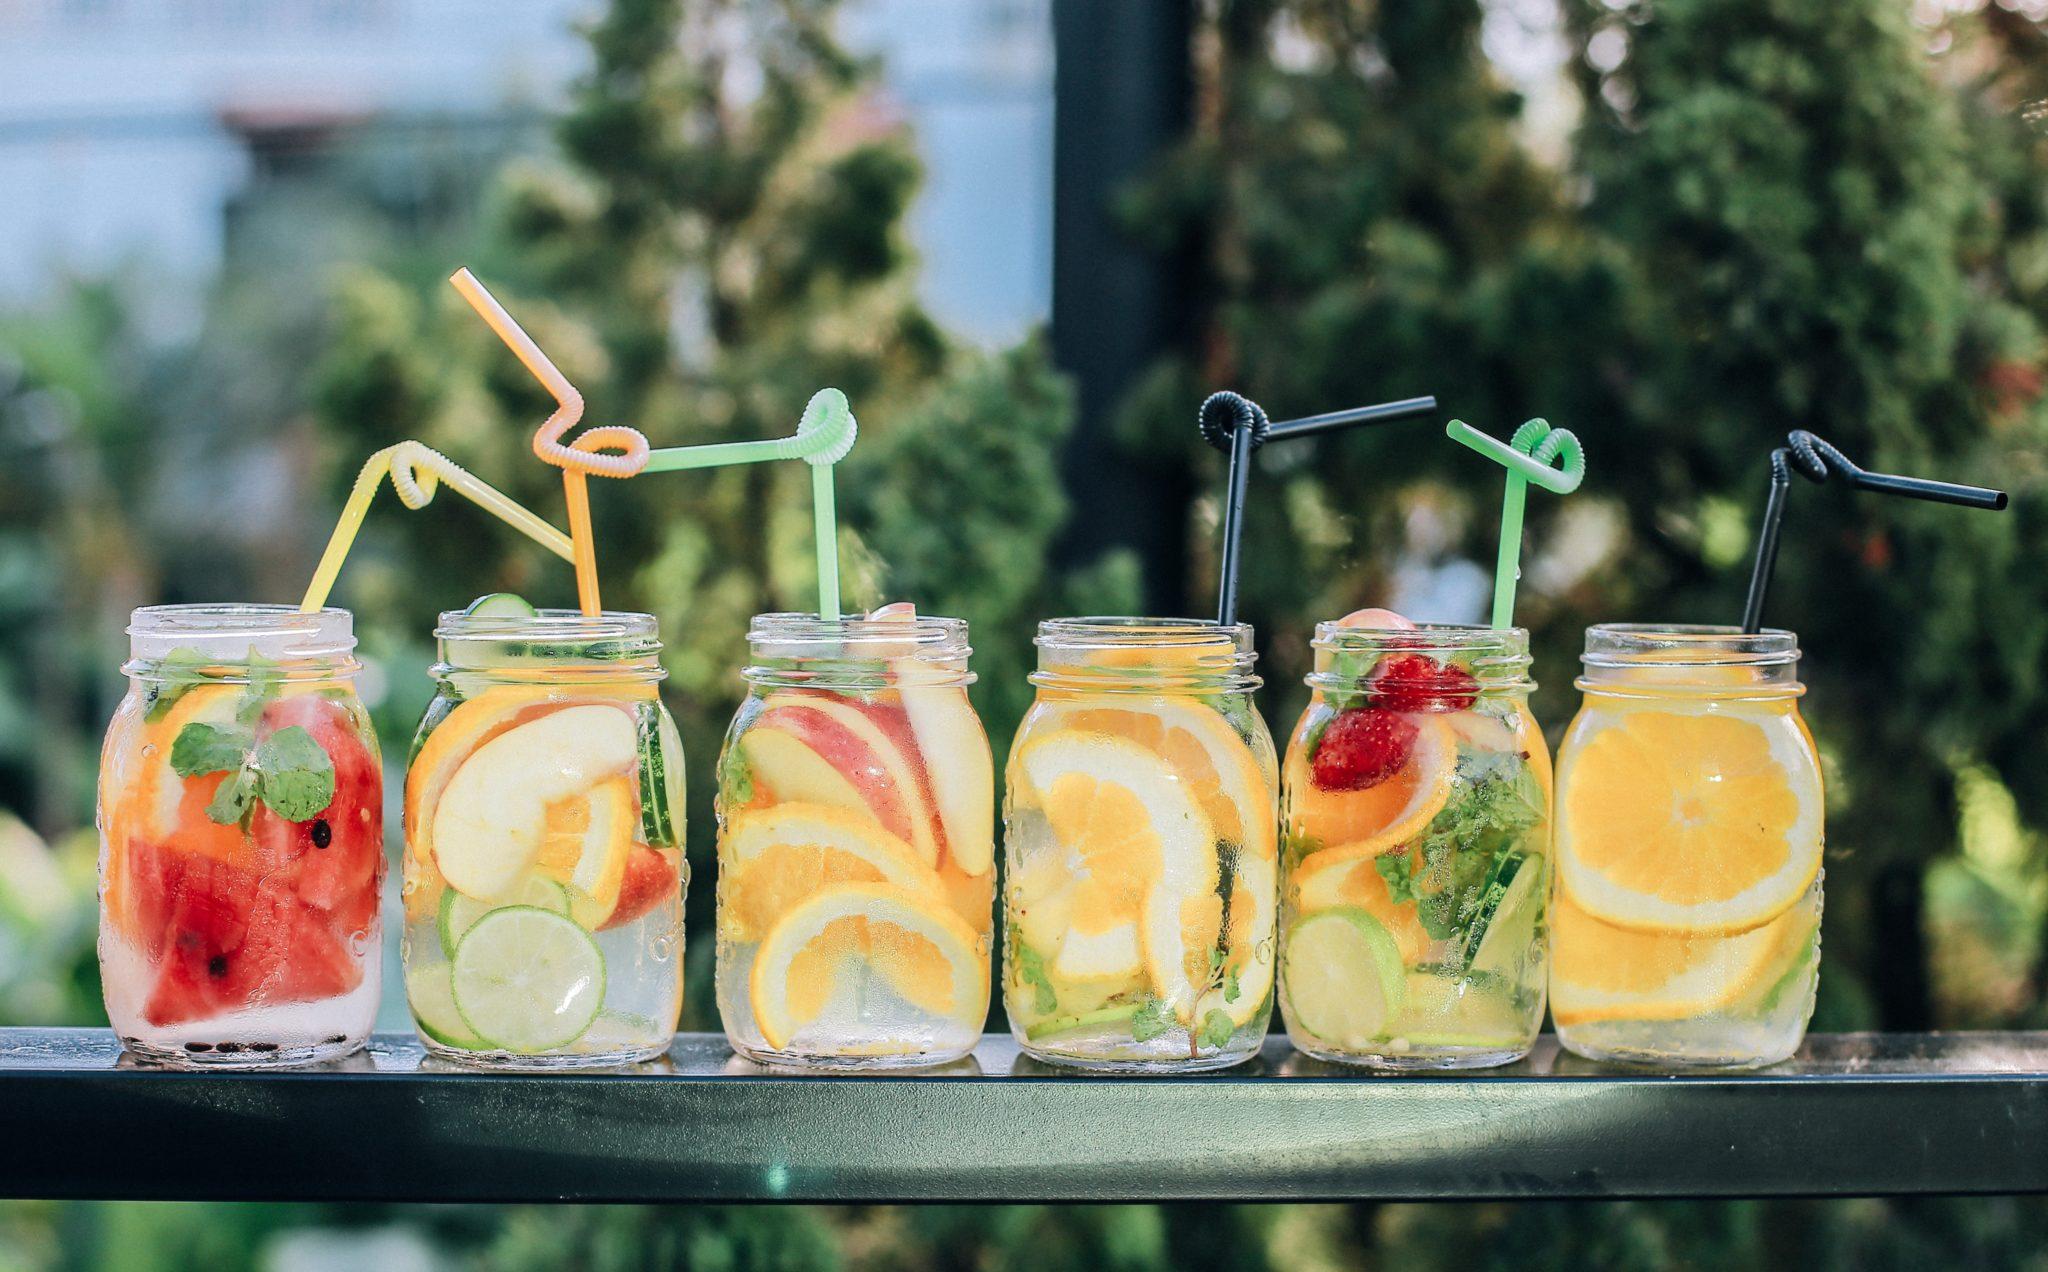 bebidas-refrescantes-retos-futuro